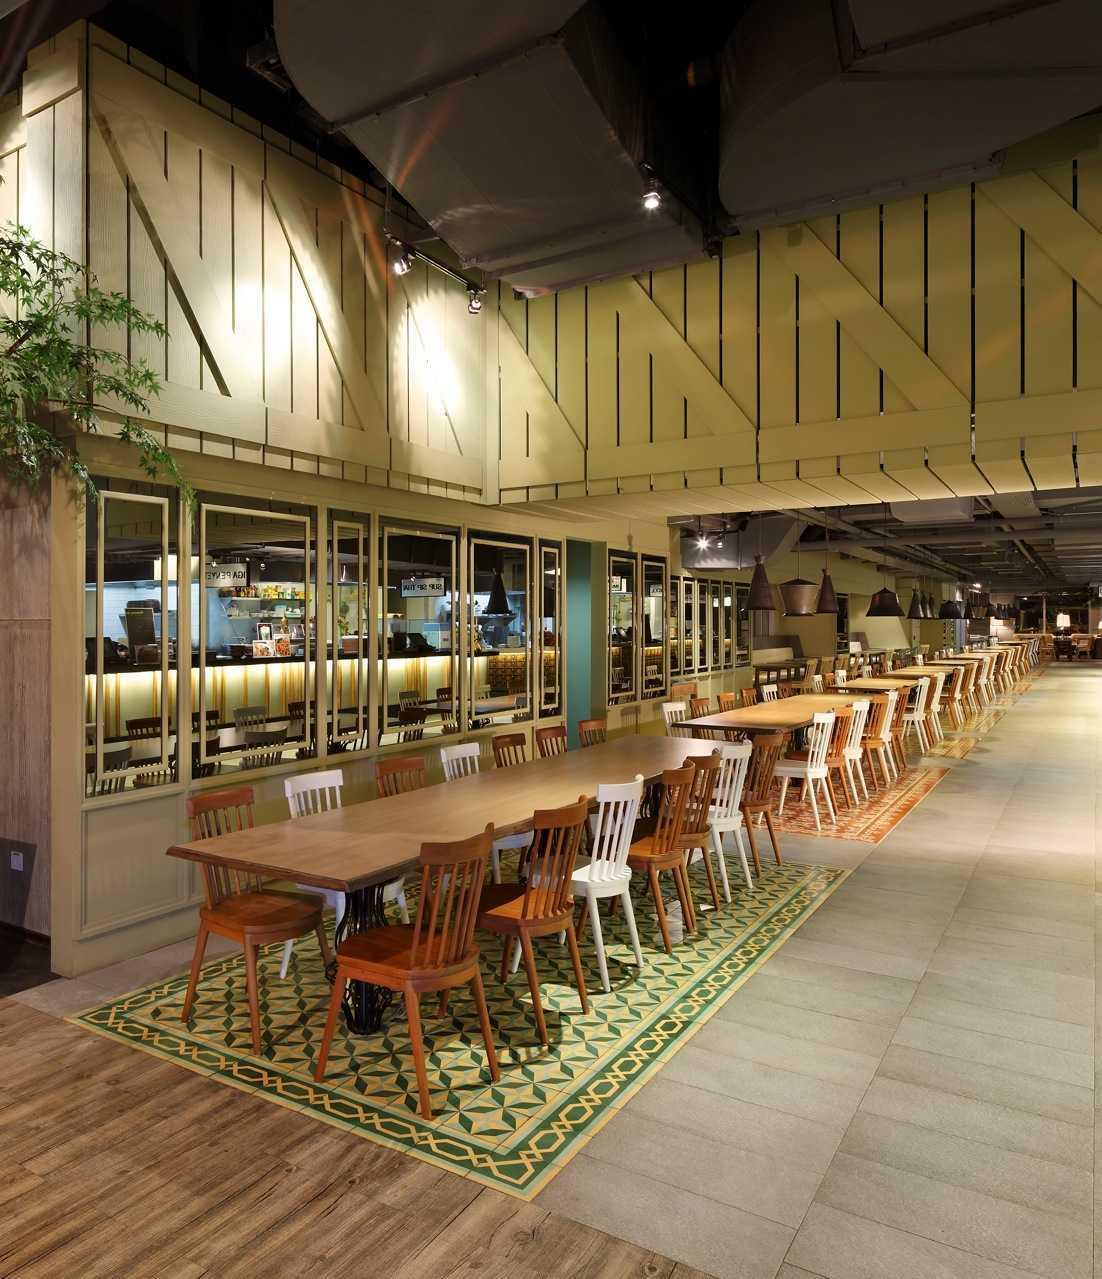 Ma-Ru Urban Kitchen  Plaza Indonesia Plaza Indonesia Seating Area Restaurant   15335